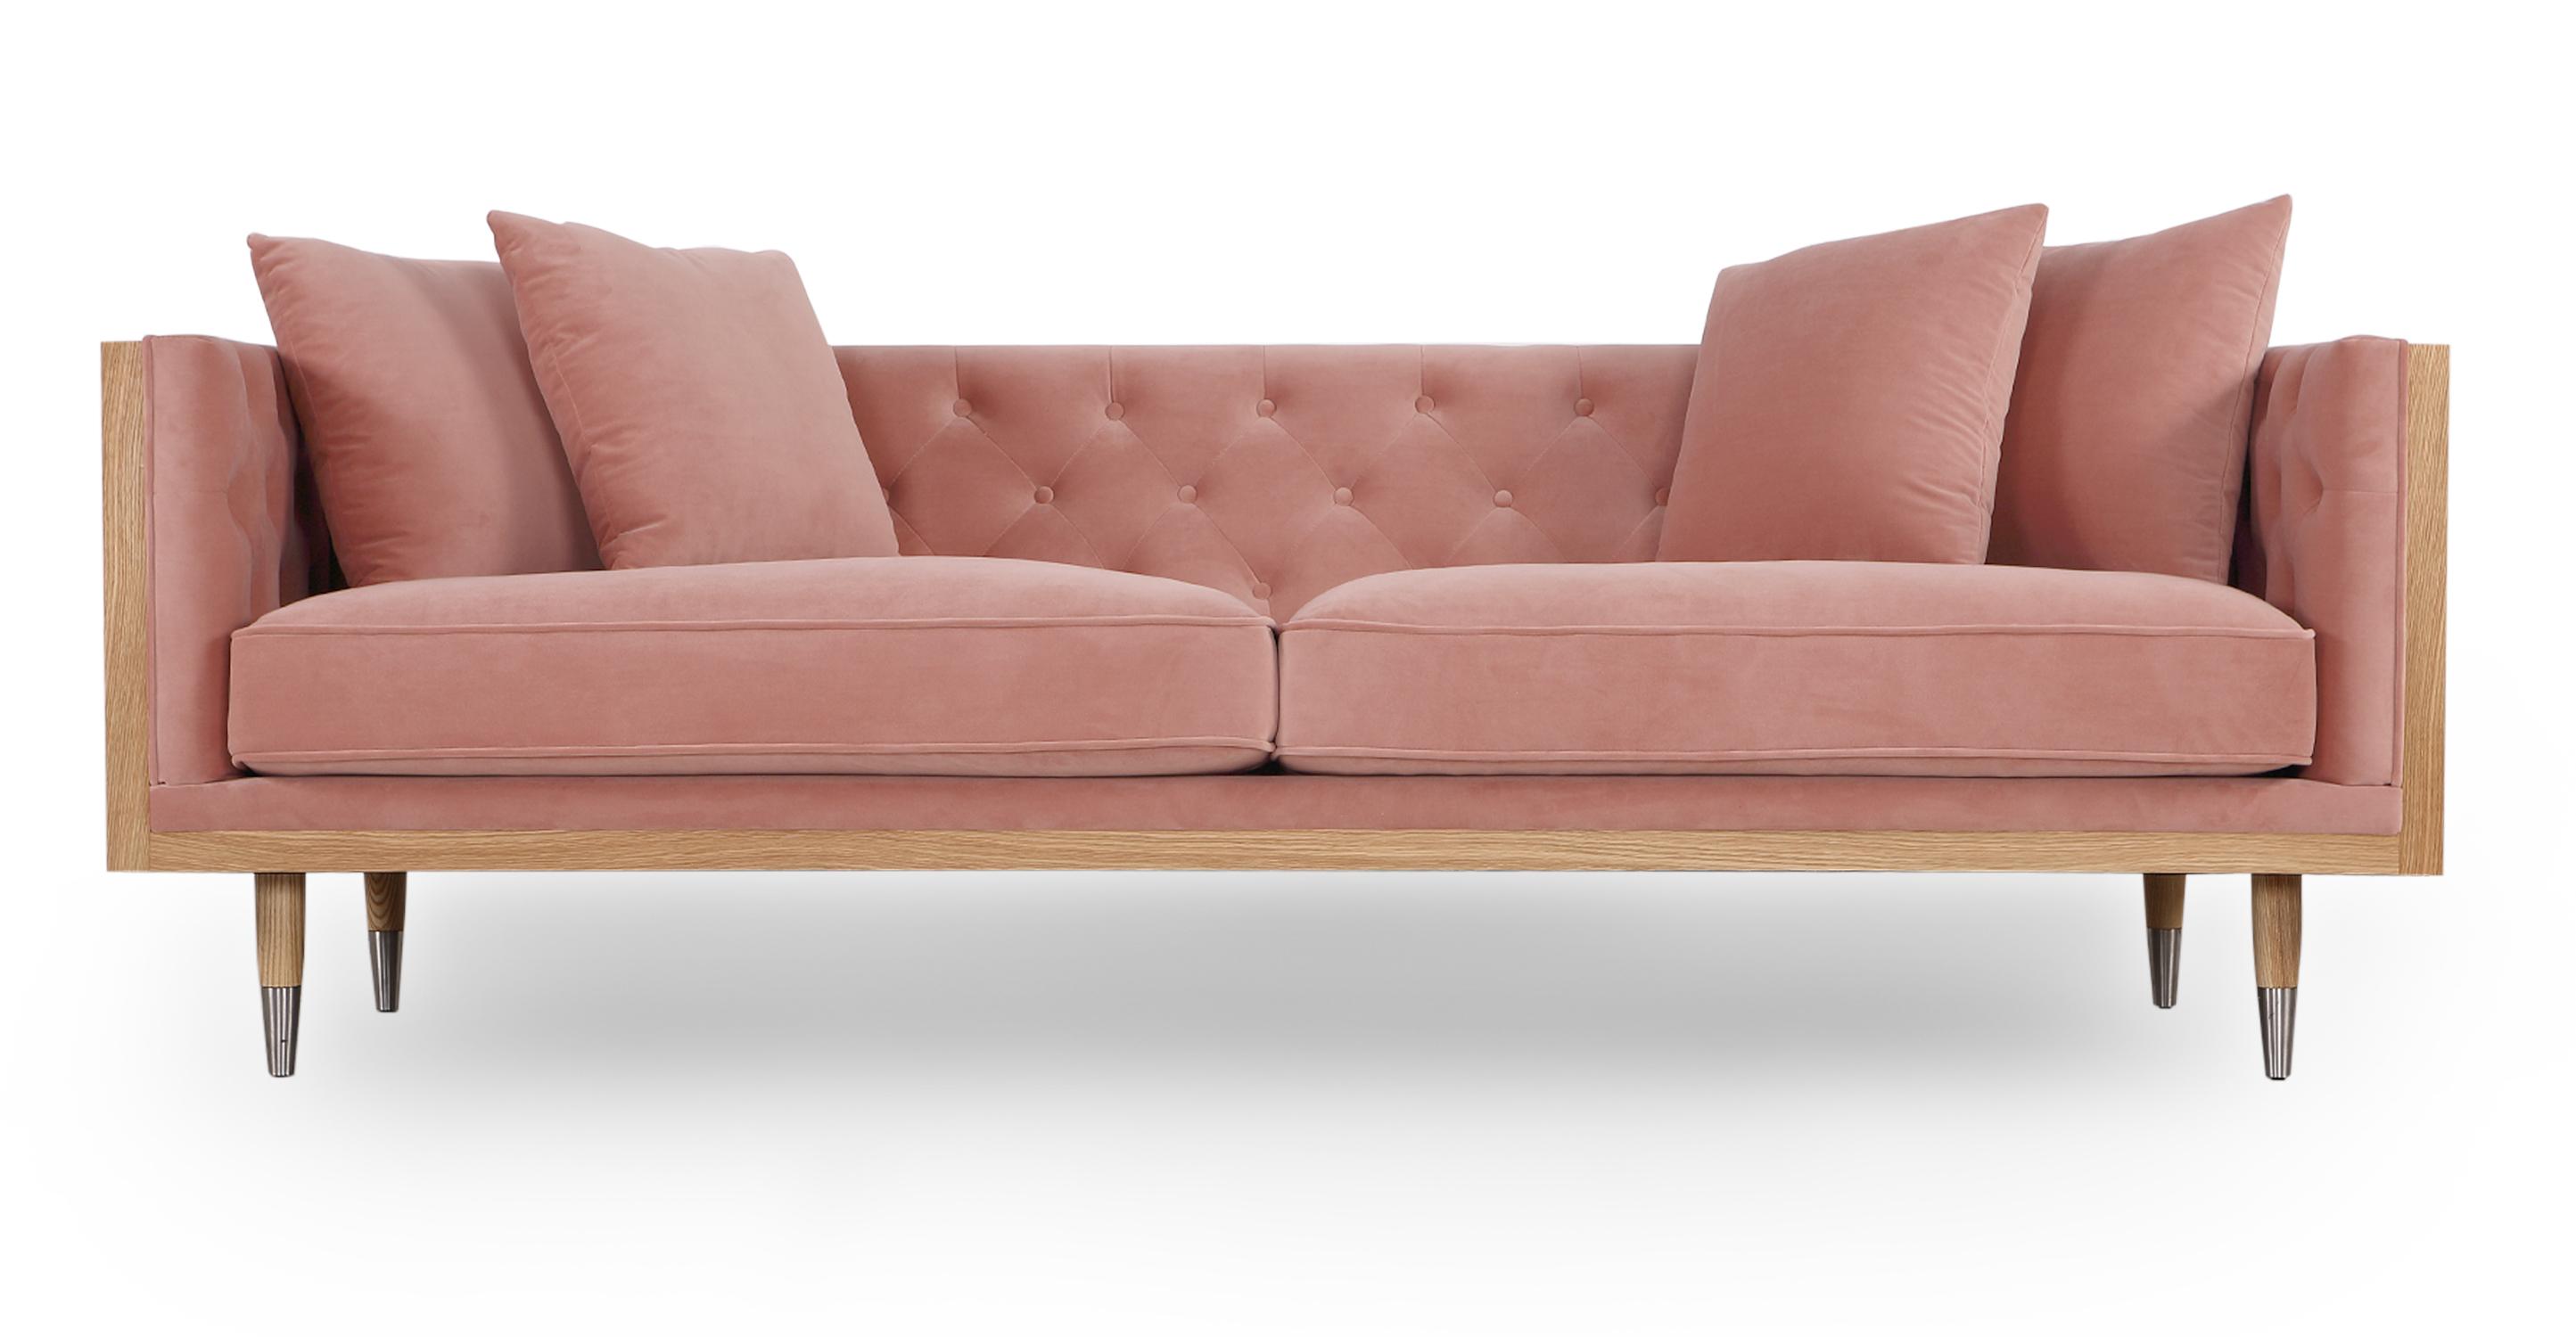 "Woodrow Neo 87"" Fabric Sofa, Ash/Blush Velvet"